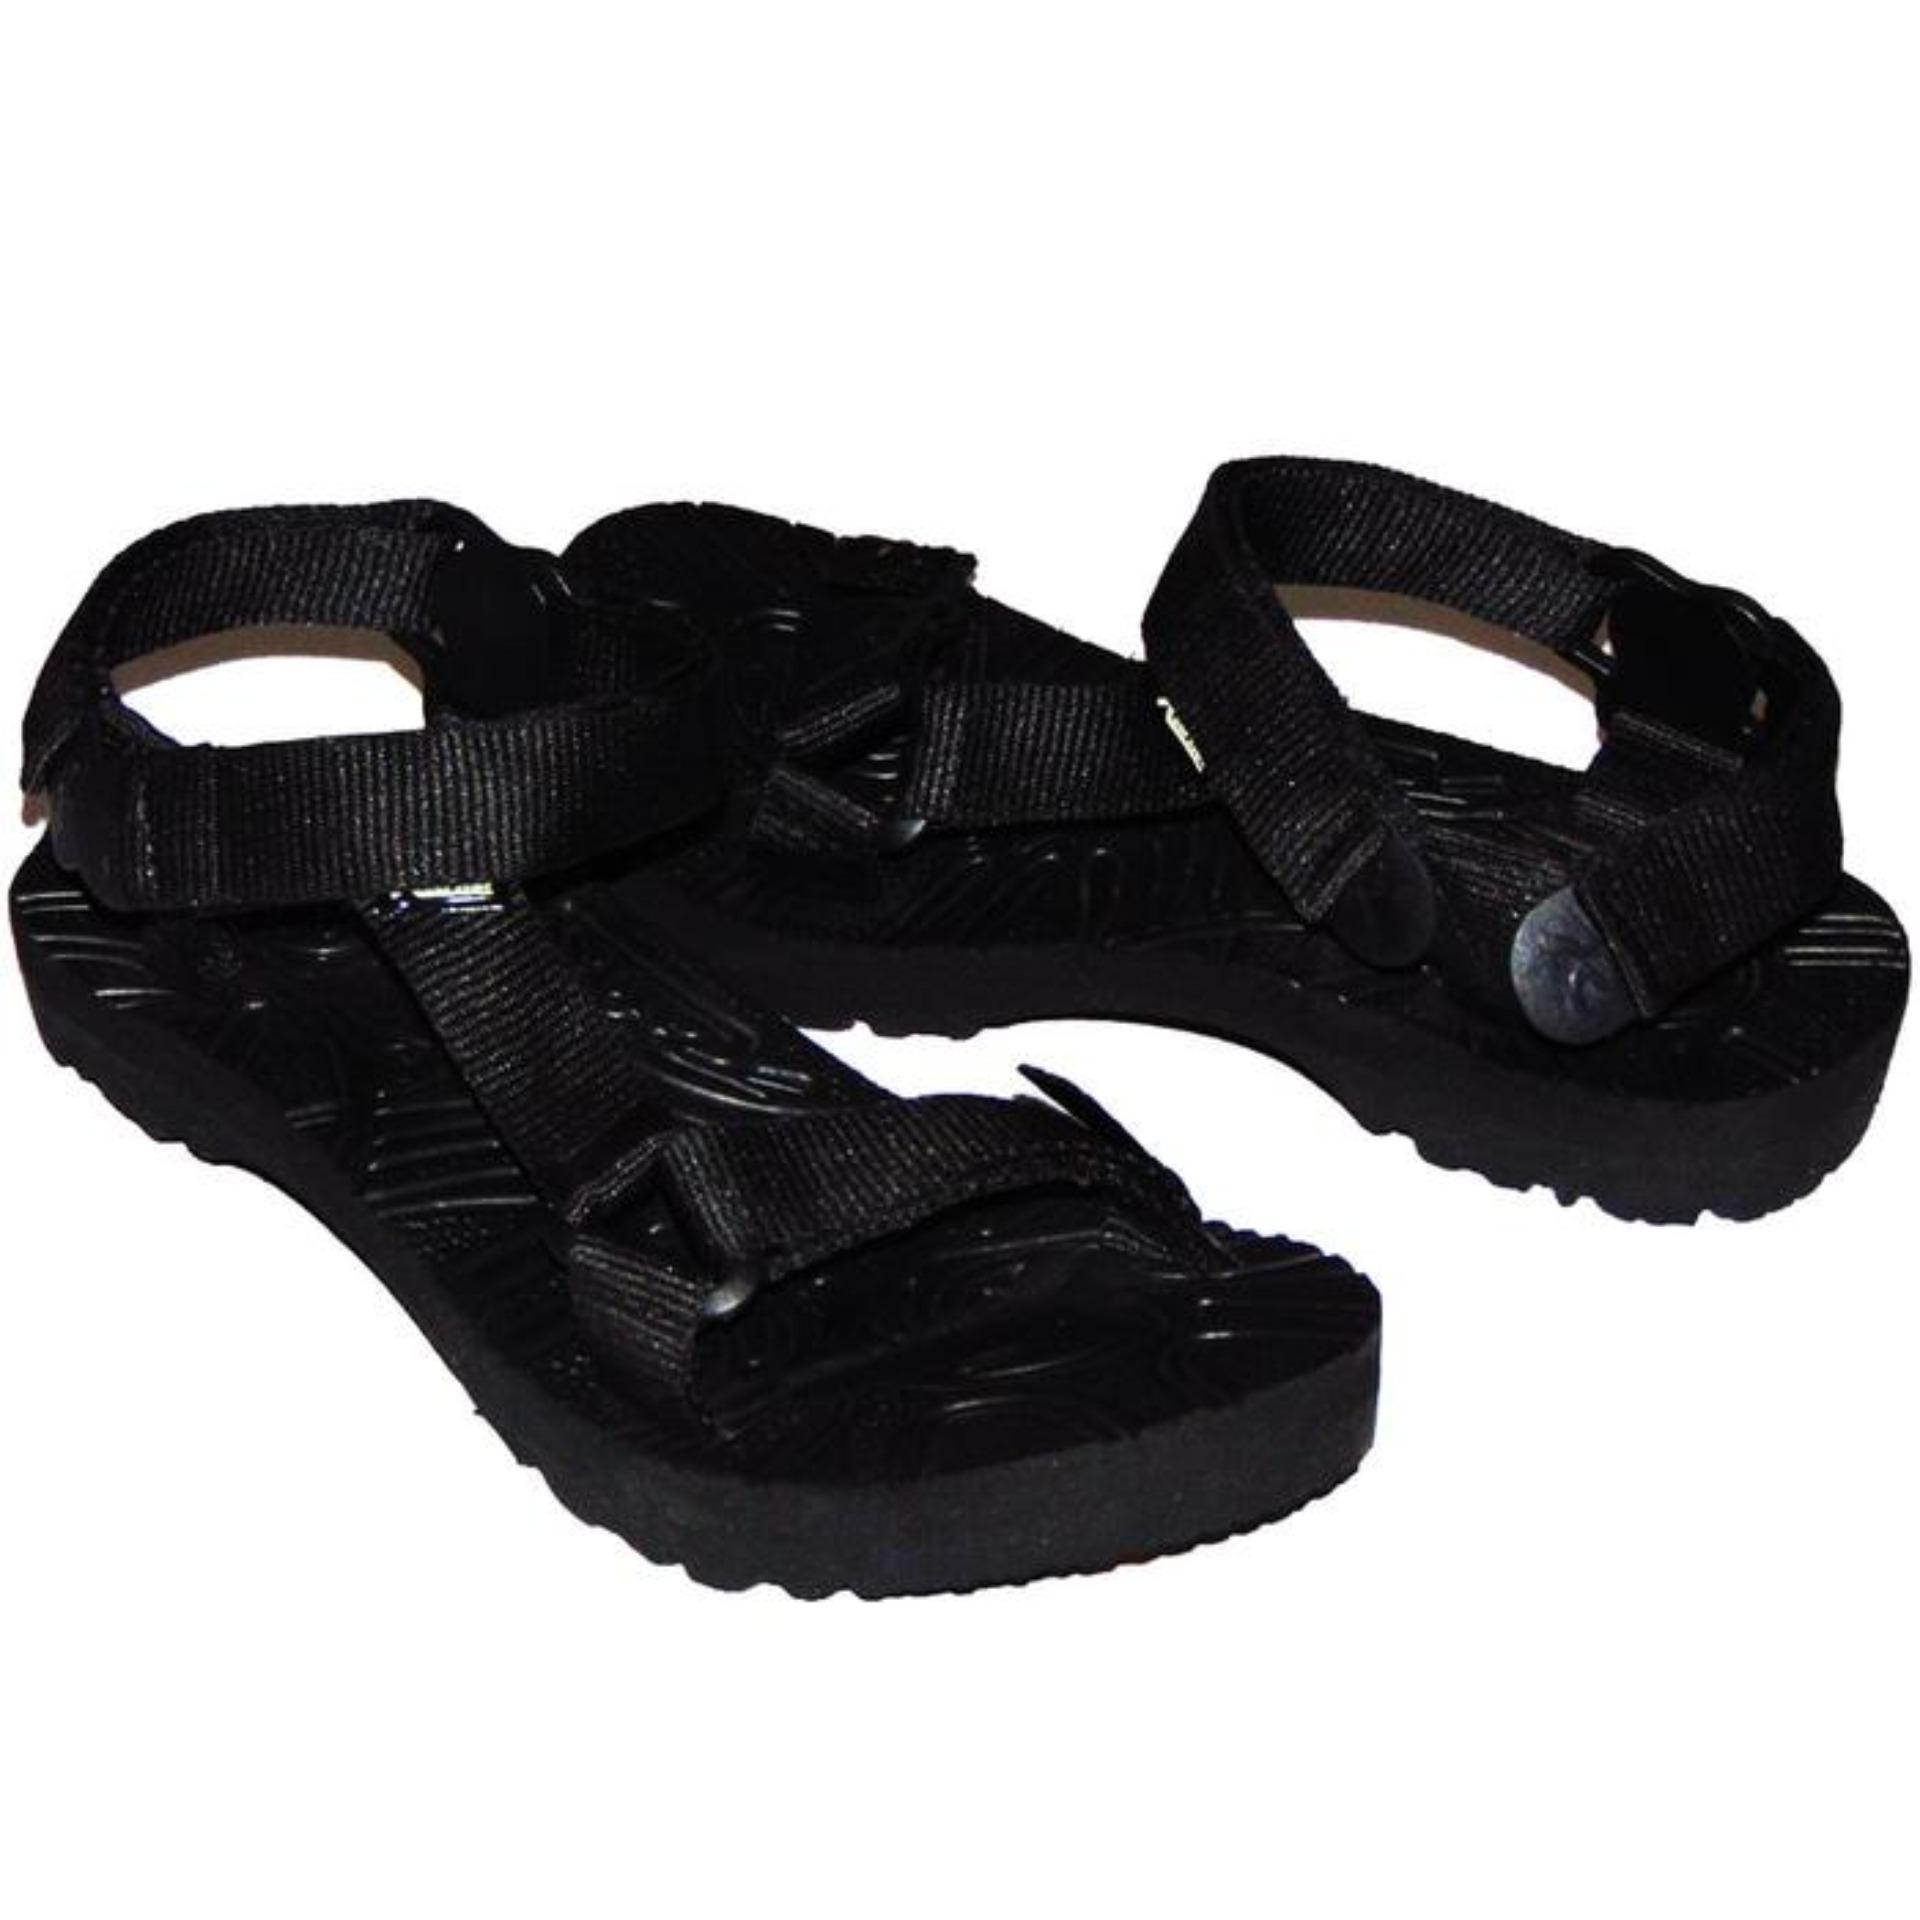 sandal gunung pria selop erger hitam